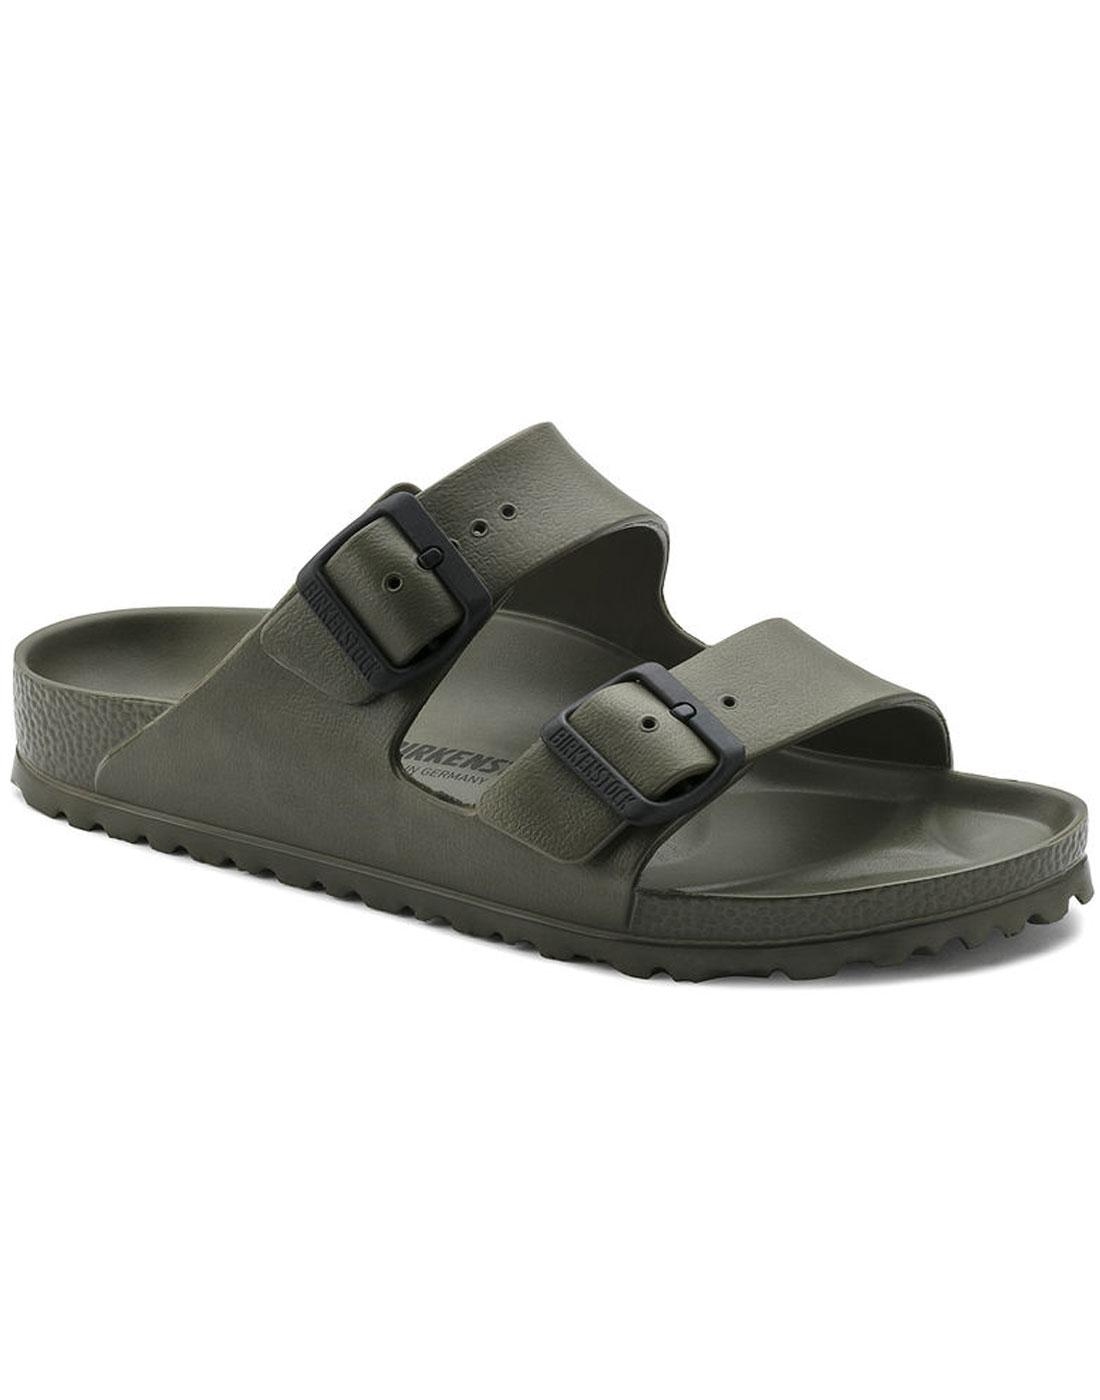 Arizona EVA BIRKENSTOCK Retro 2 Strap Sandals (K)